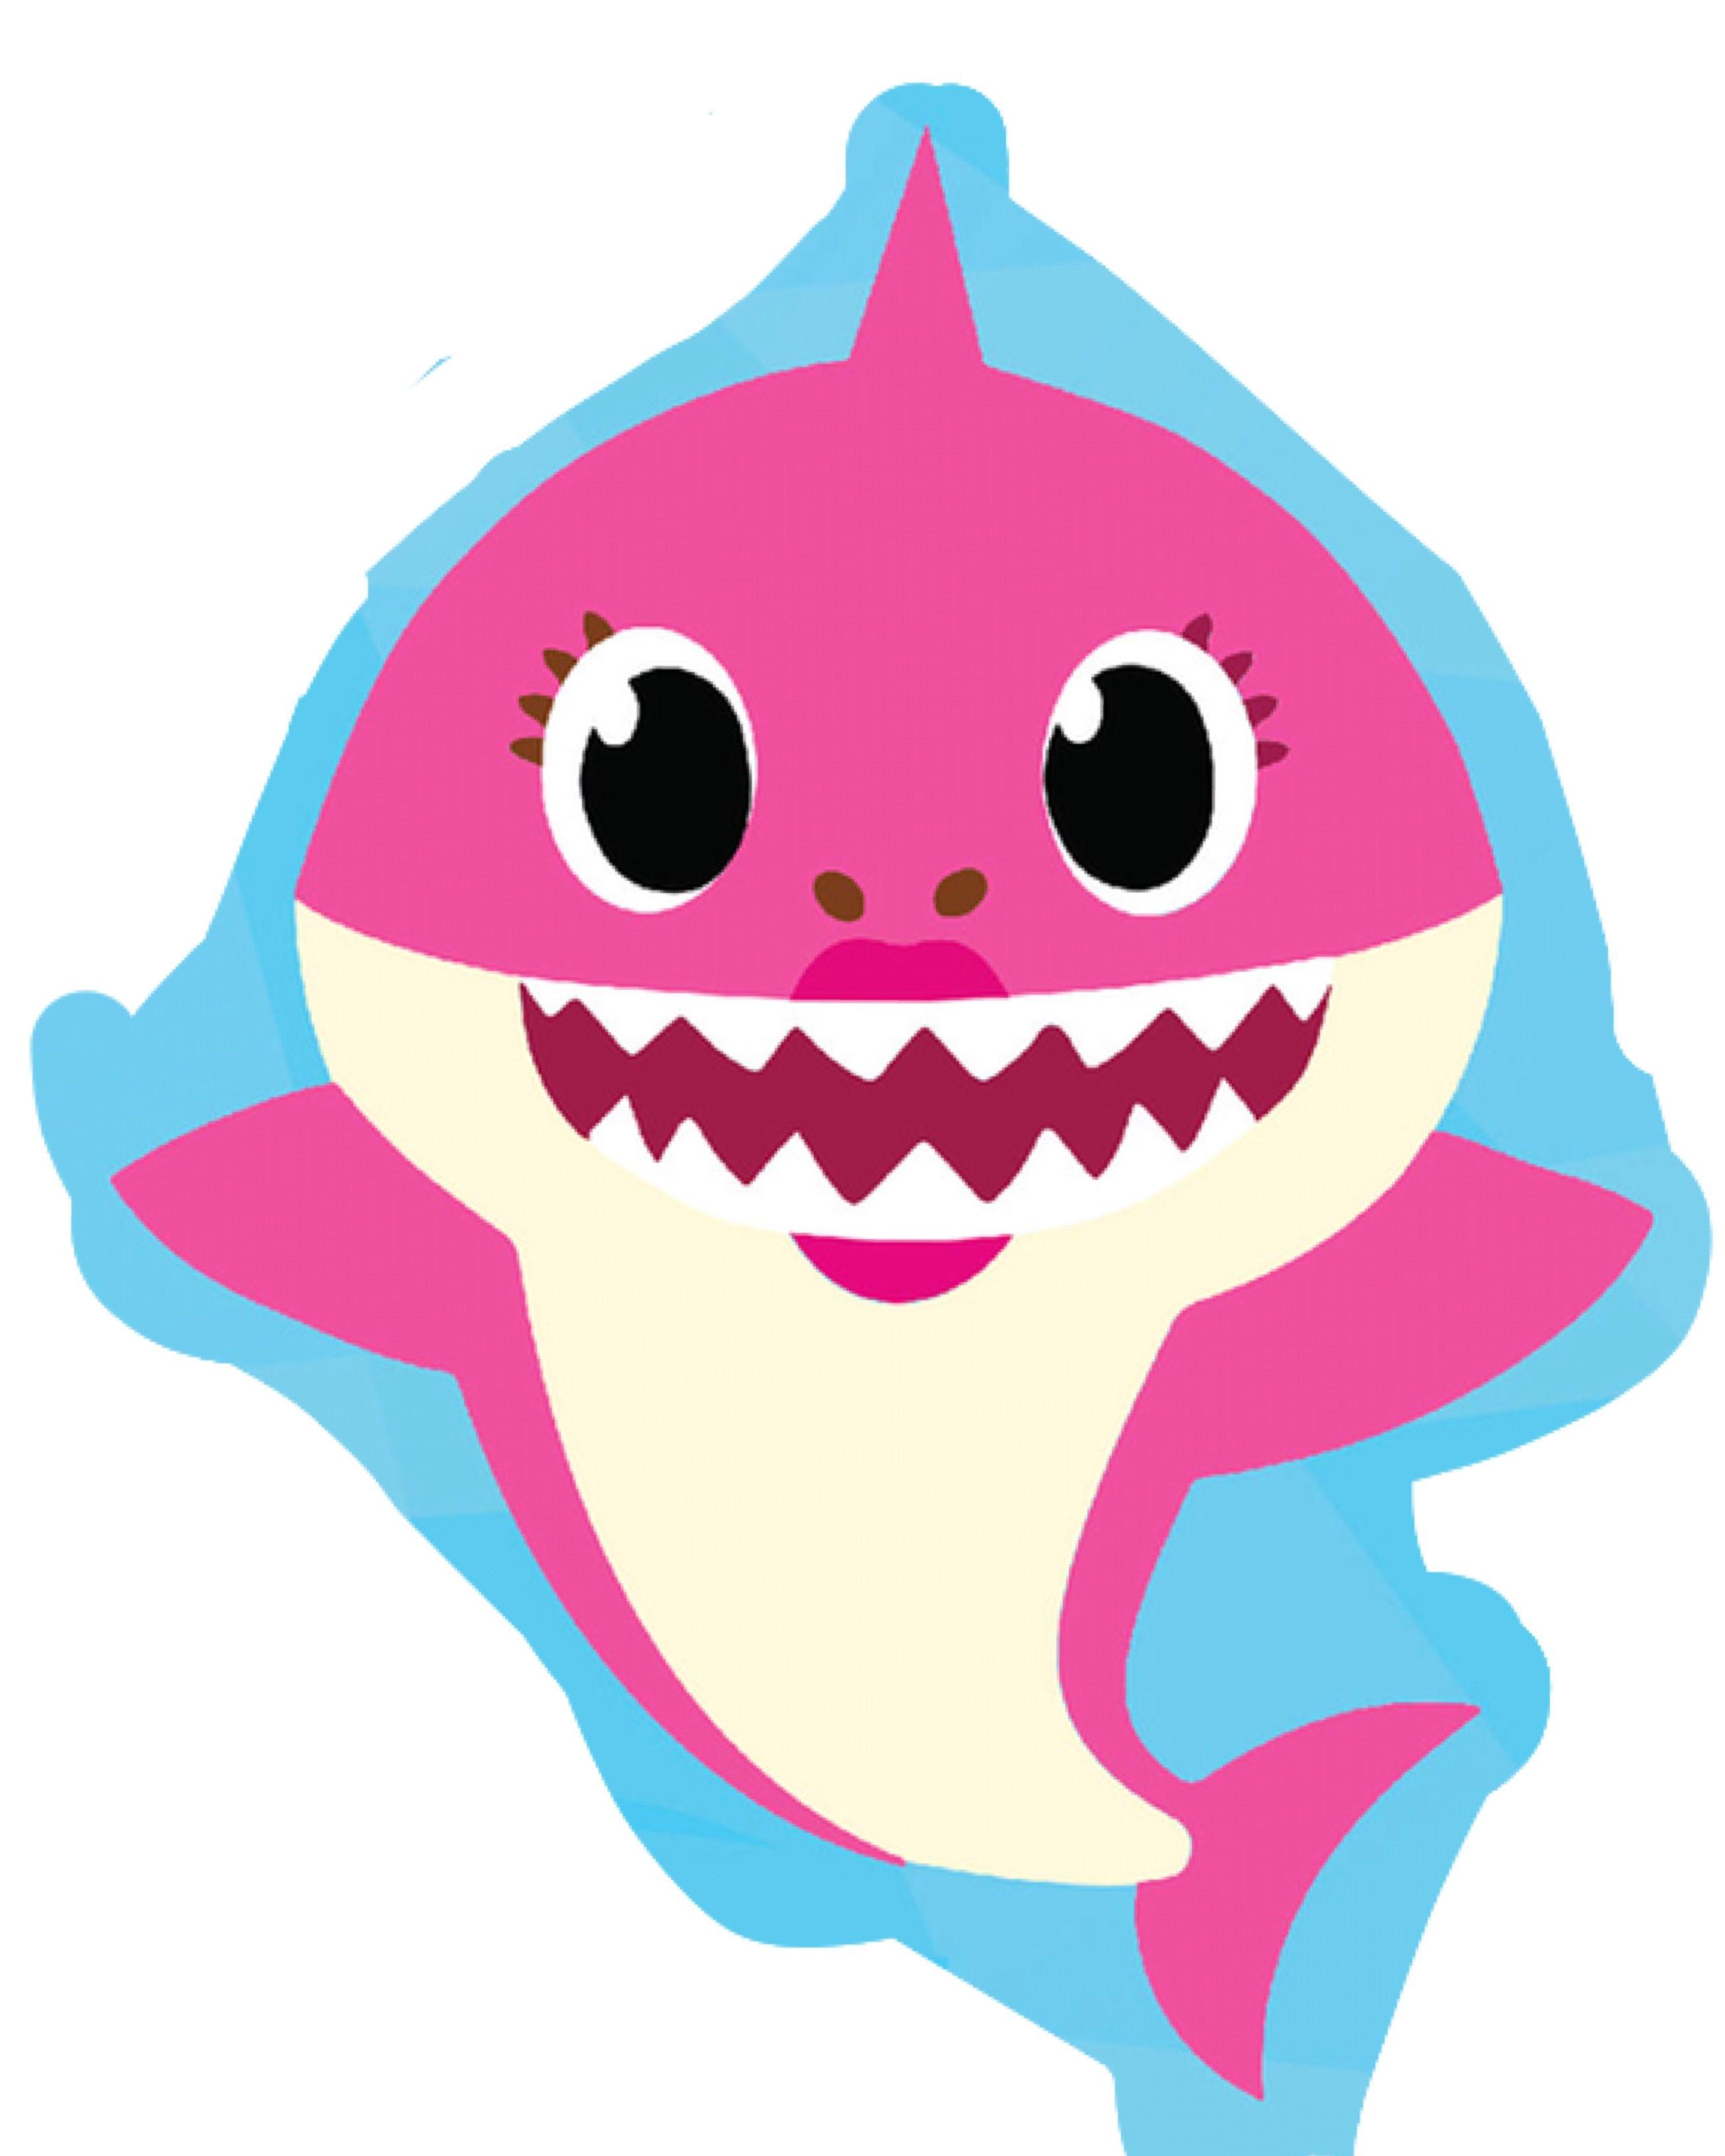 Pin By Karena Carrillo On Baby Shark In 2019 Baby Shark